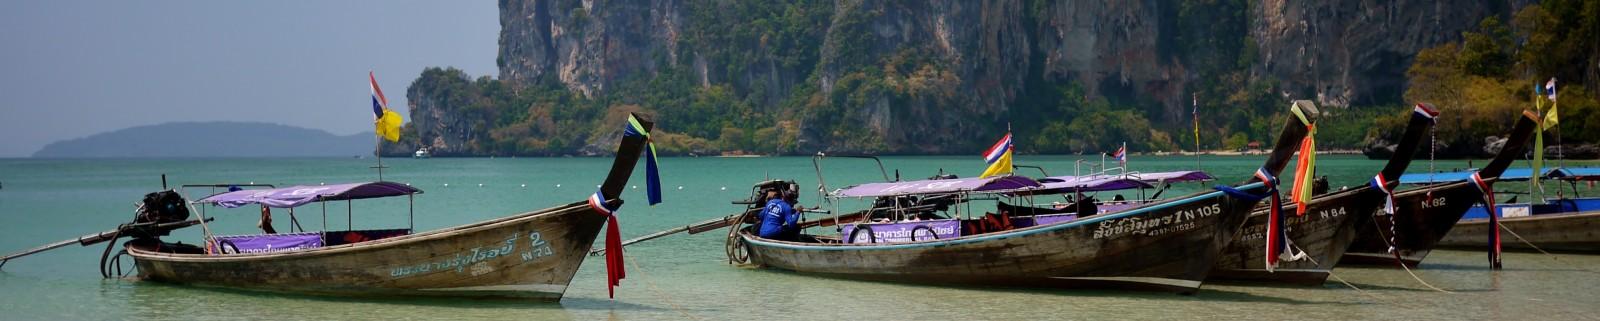 Railay Beach Thailand longboats